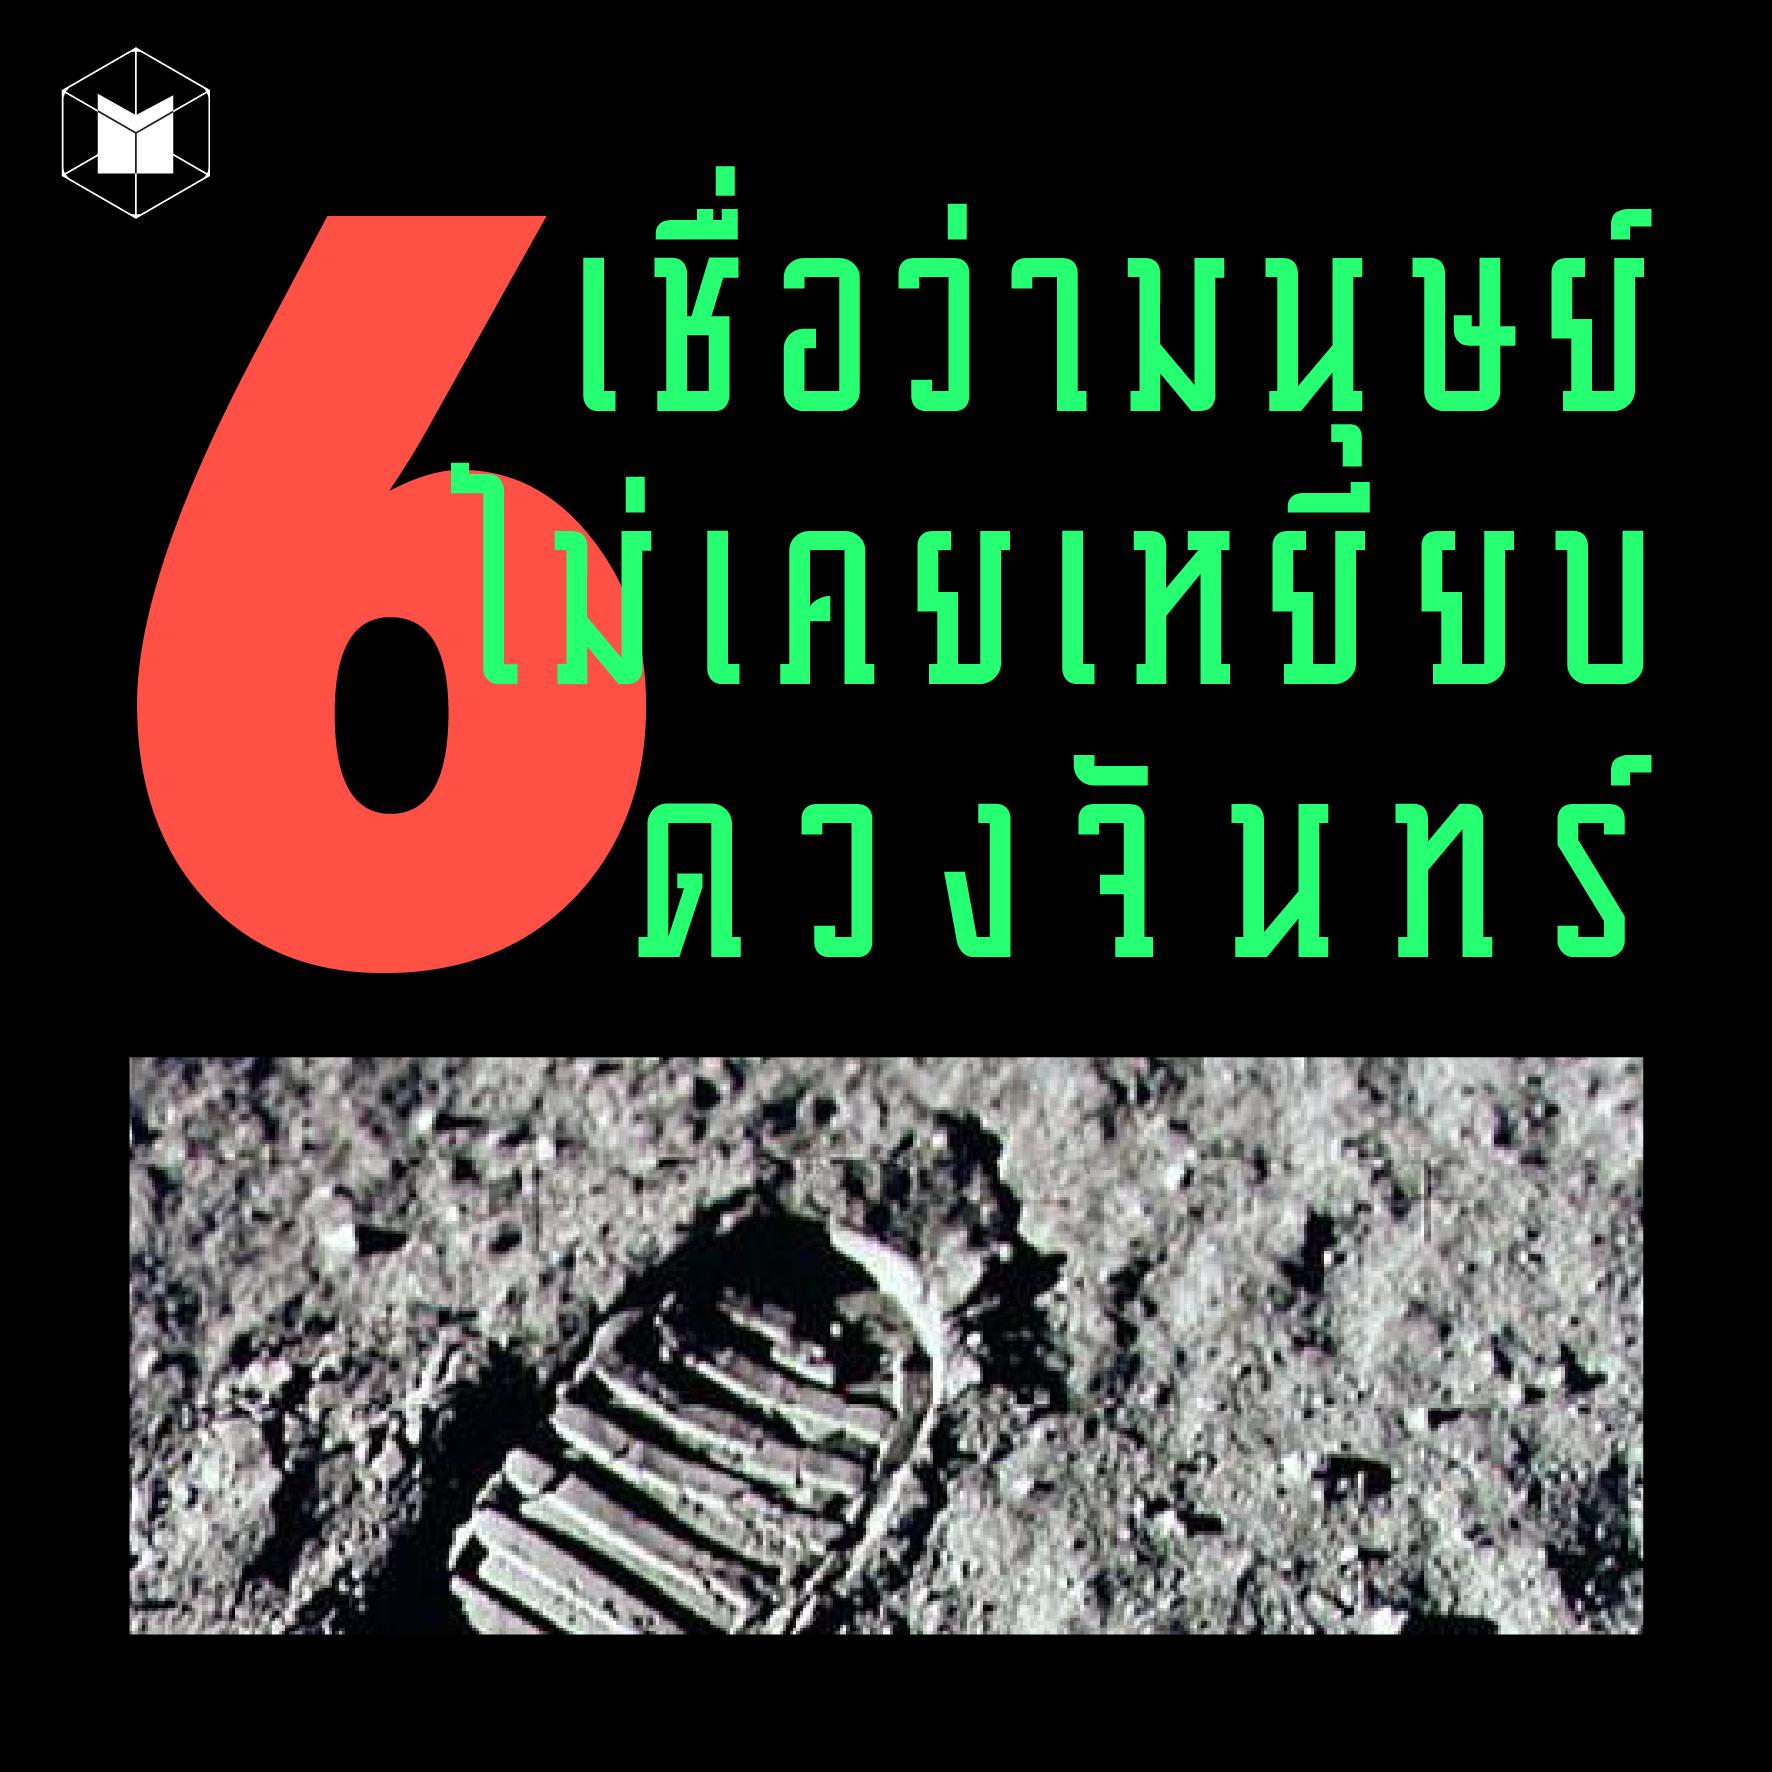 conspiracy-06